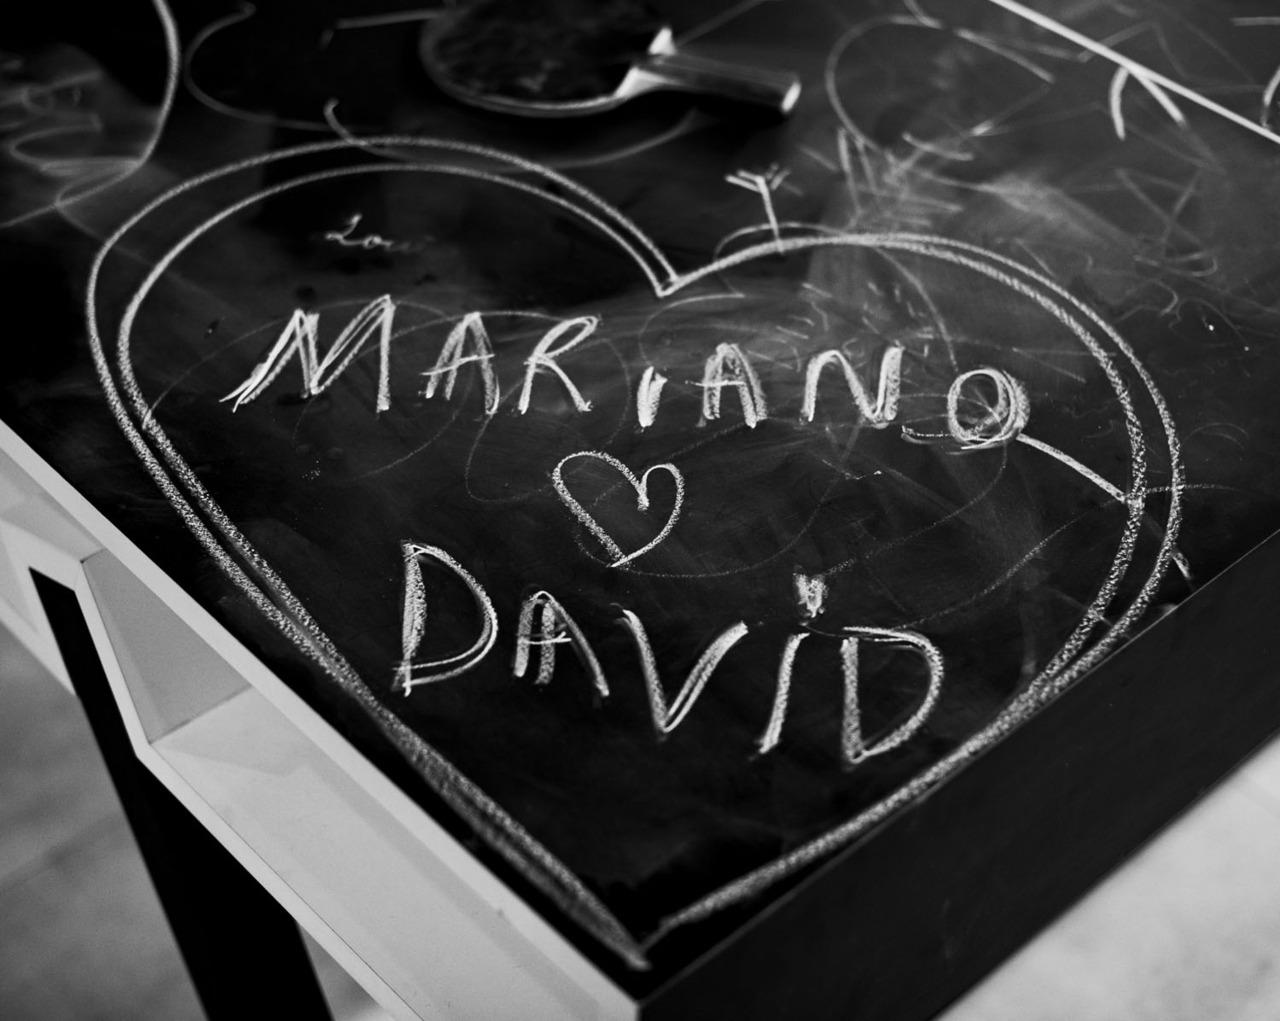 http://2.bp.blogspot.com/-2Yr1Cs6Hecg/Tq0nbLdVAxI/AAAAAAAAIG0/5TtPhp-QV_M/s1600/David-Gandy-Mariano-Vivanco-Homotography-4.jpg